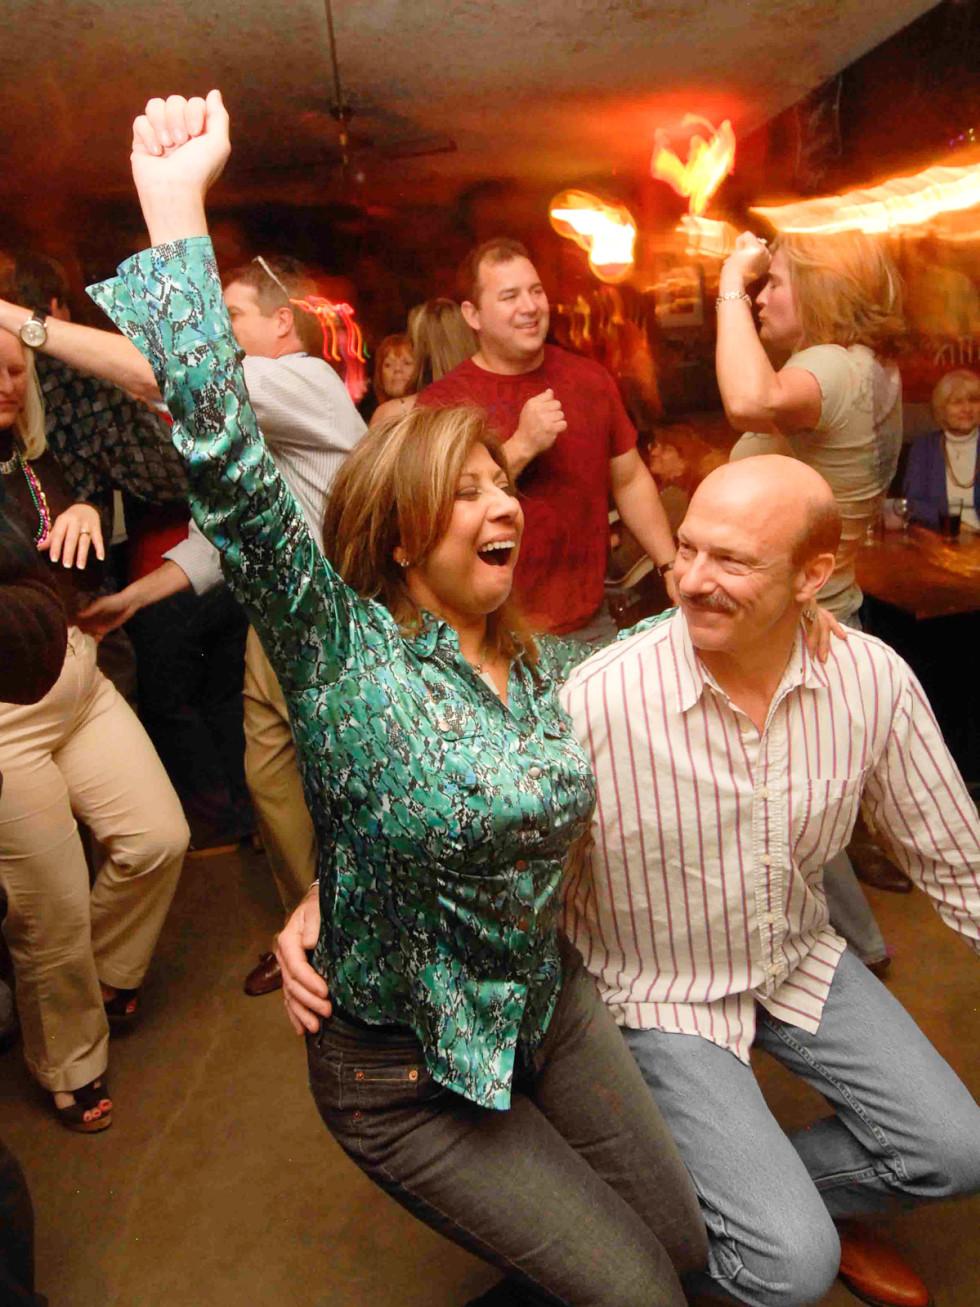 News_The Big Easy_Feb. 2010_Sylvia Camarillo_Rick Mikeska